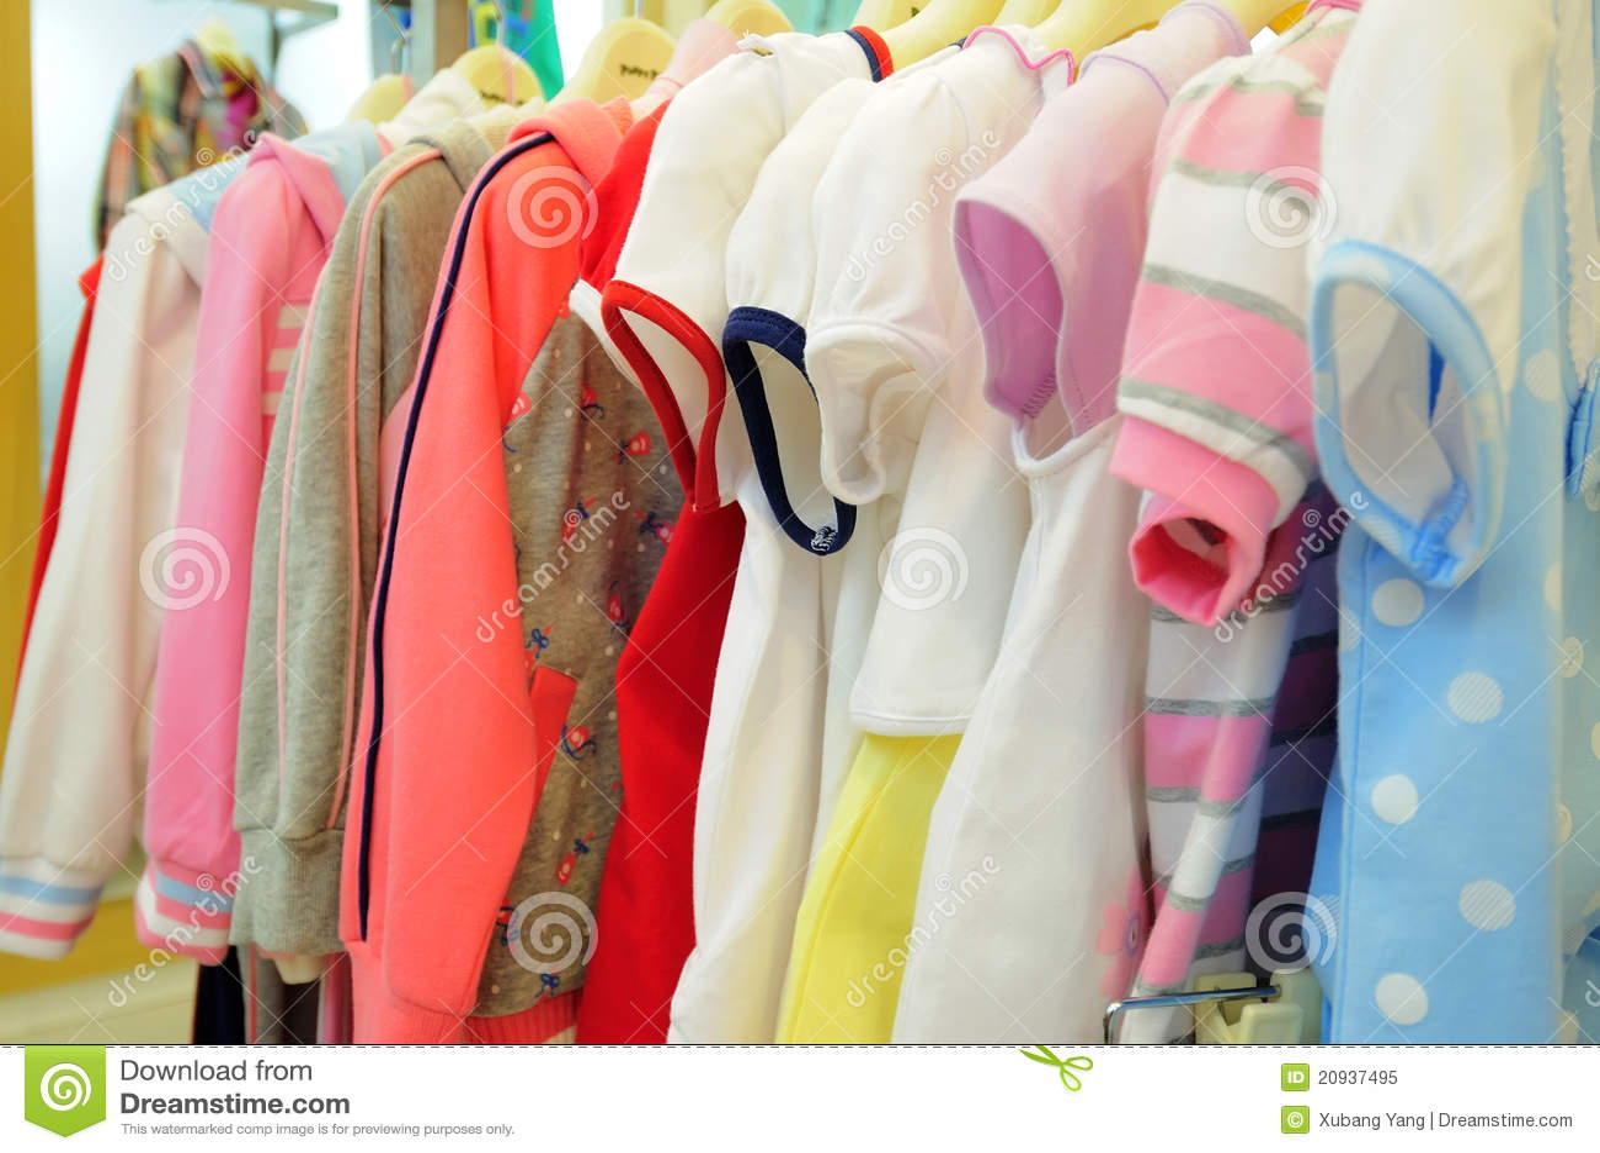 Kids Clothing Websites